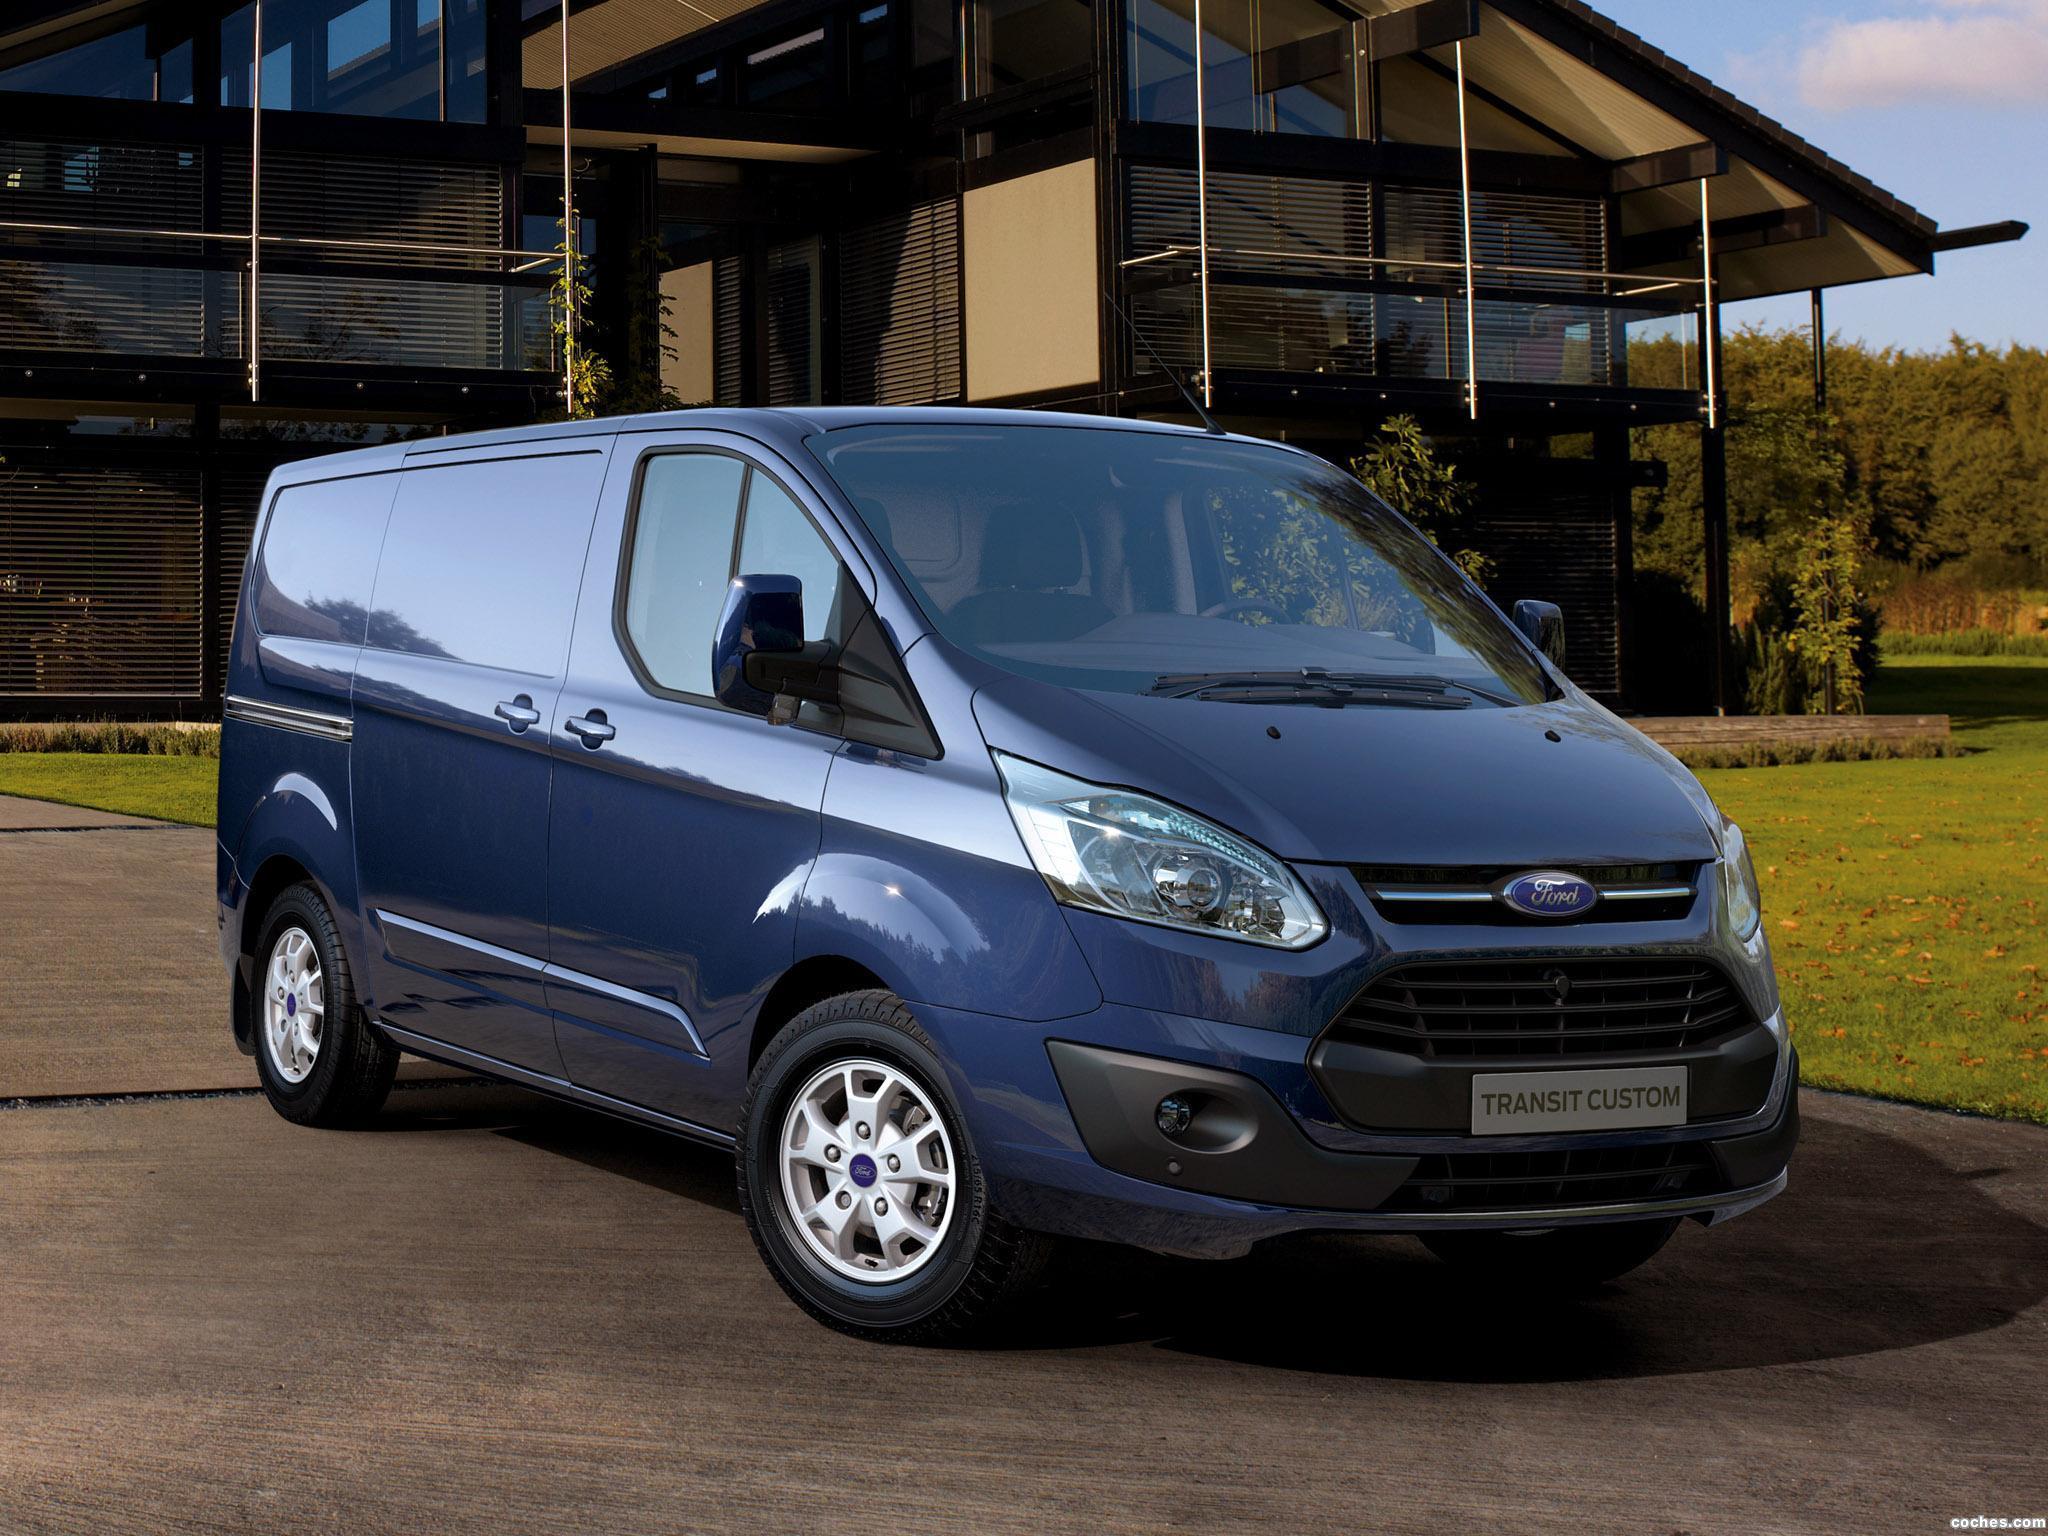 Foto 0 de Ford Custom 2012